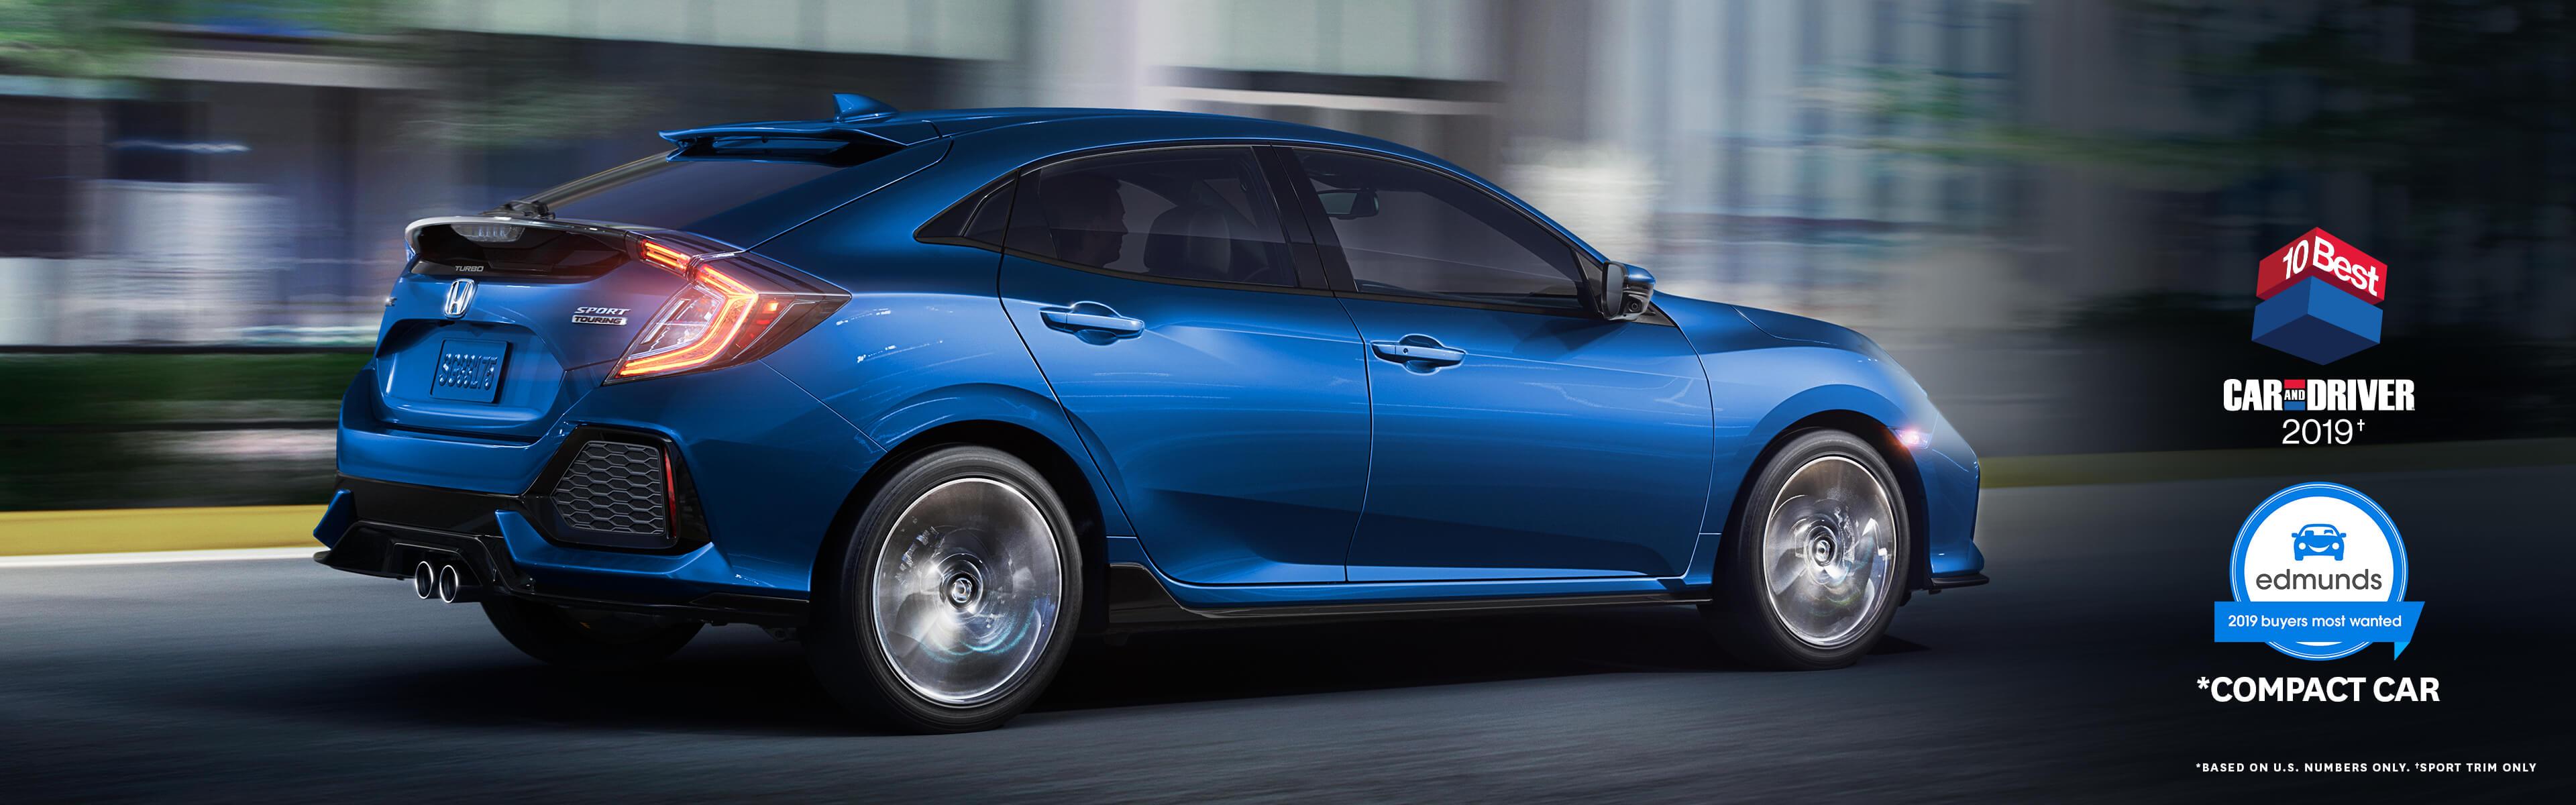 The 2019 Civic Hatchback Honda Canada